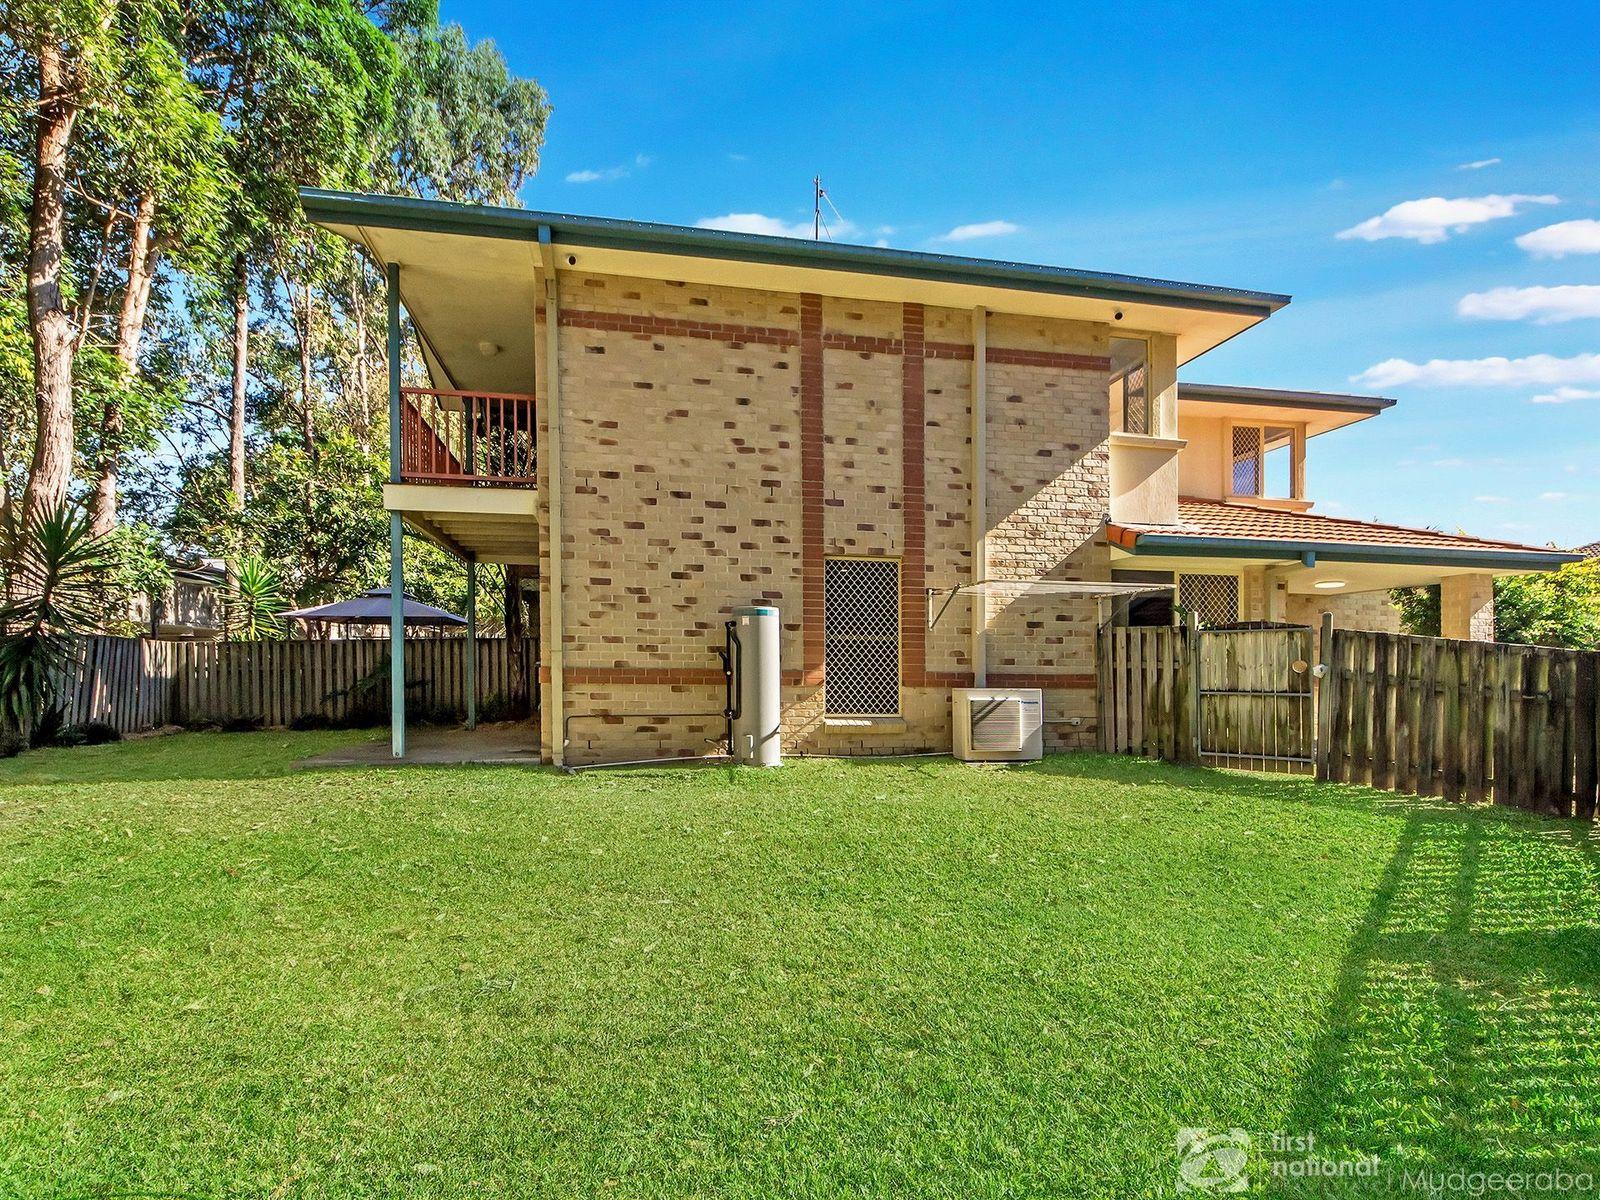 63/21 Leviathan Drive, Mudgeeraba, QLD 4213